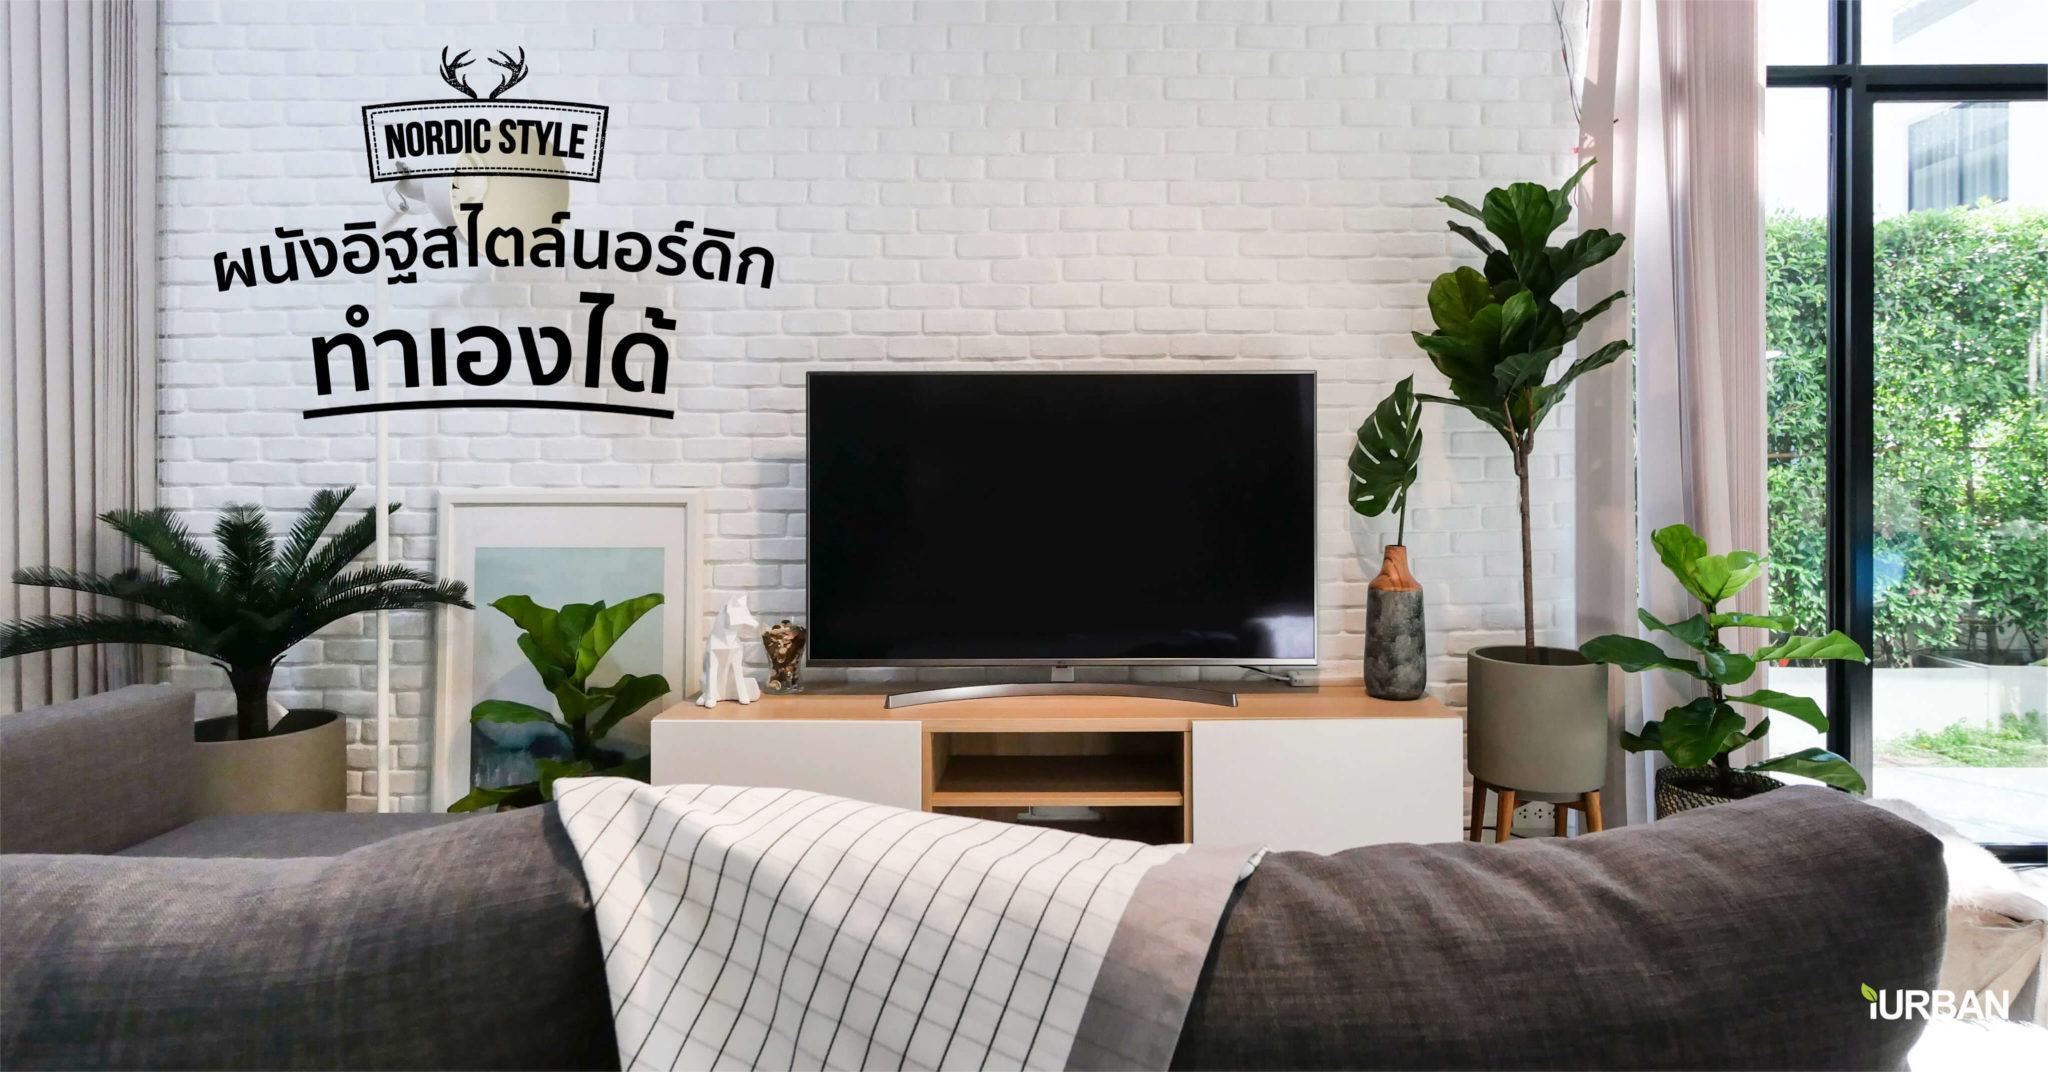 How to เปลี่ยนห้องนั่งเล่นเป็นสไตล์ Nordic ทำเองได้ ง่ายนิดเดียว! 13 - Nordic